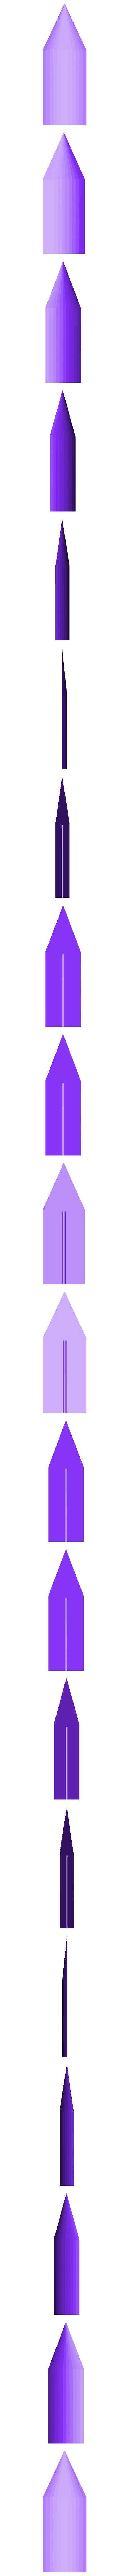 blade_tip_100mm_split_flat.stl Download free STL file Life-Sized Sword of Omens • 3D print template, Revalia6D